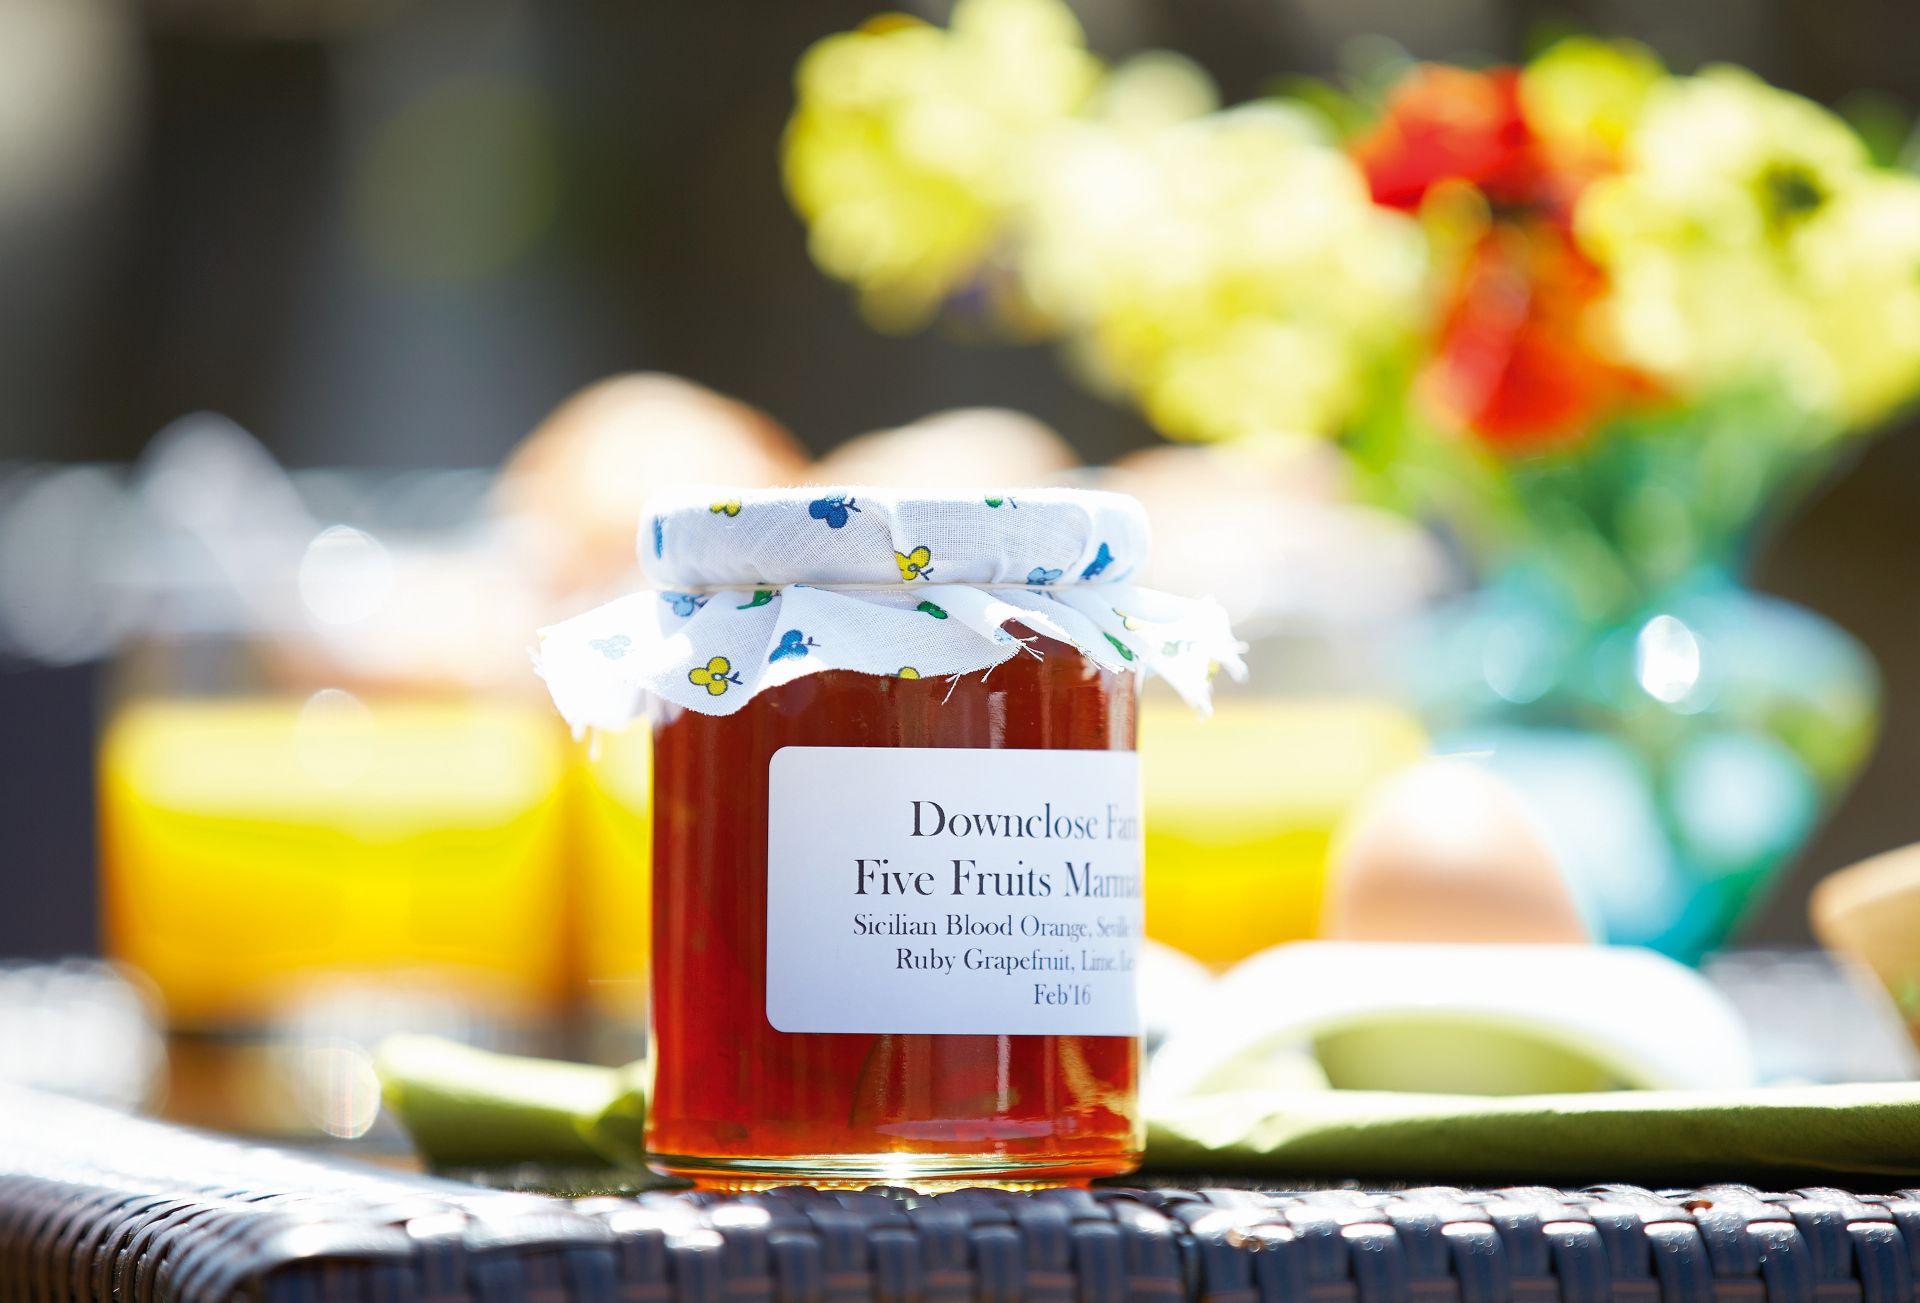 Sample the delights of Downclose Farm